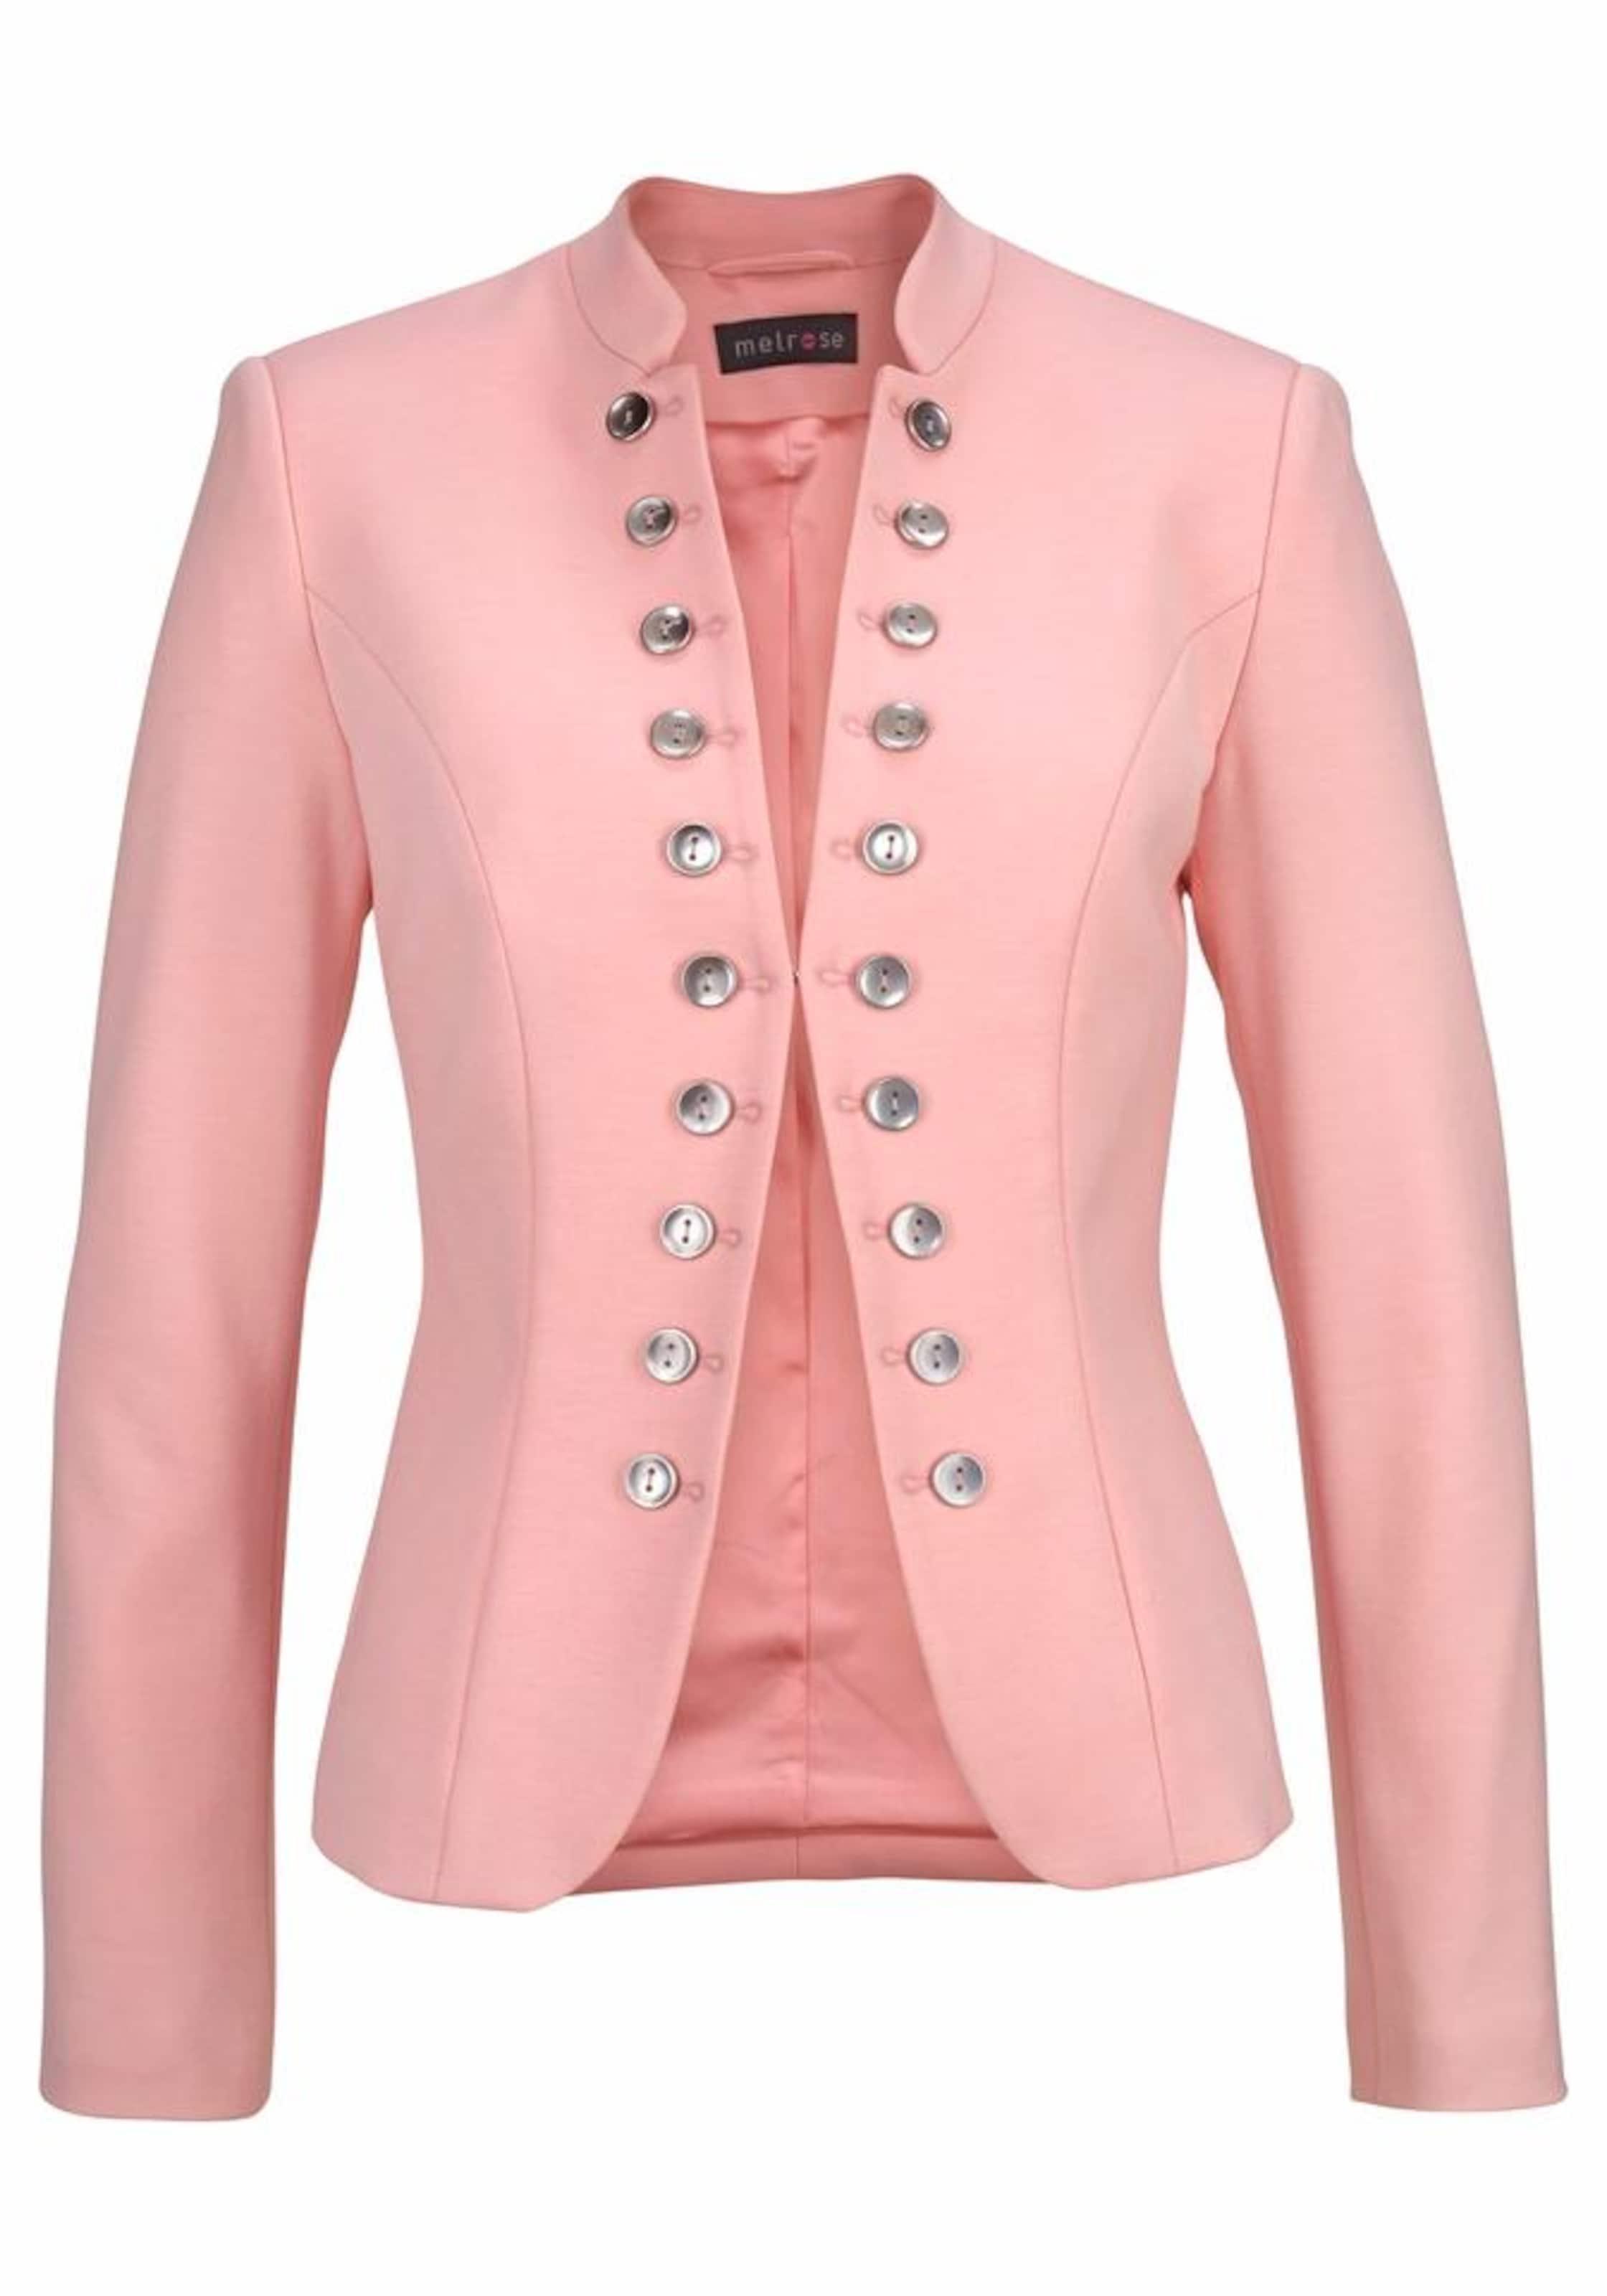 Blazer Rosé Rosé Blazer Melrose Melrose In Melrose In tsrdChQx